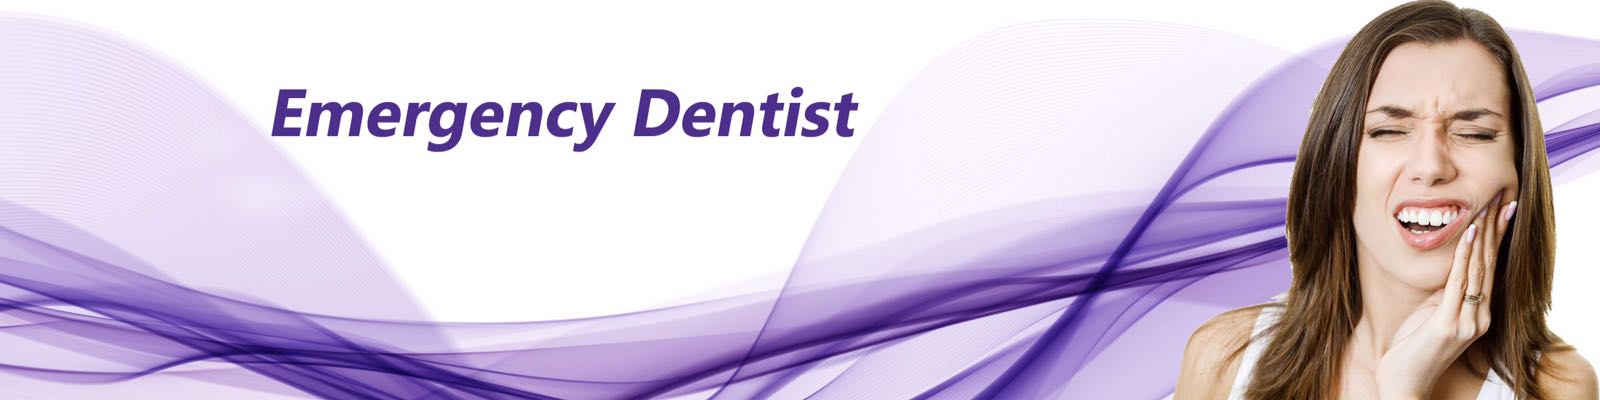 Emergency Dentist In Edinburg